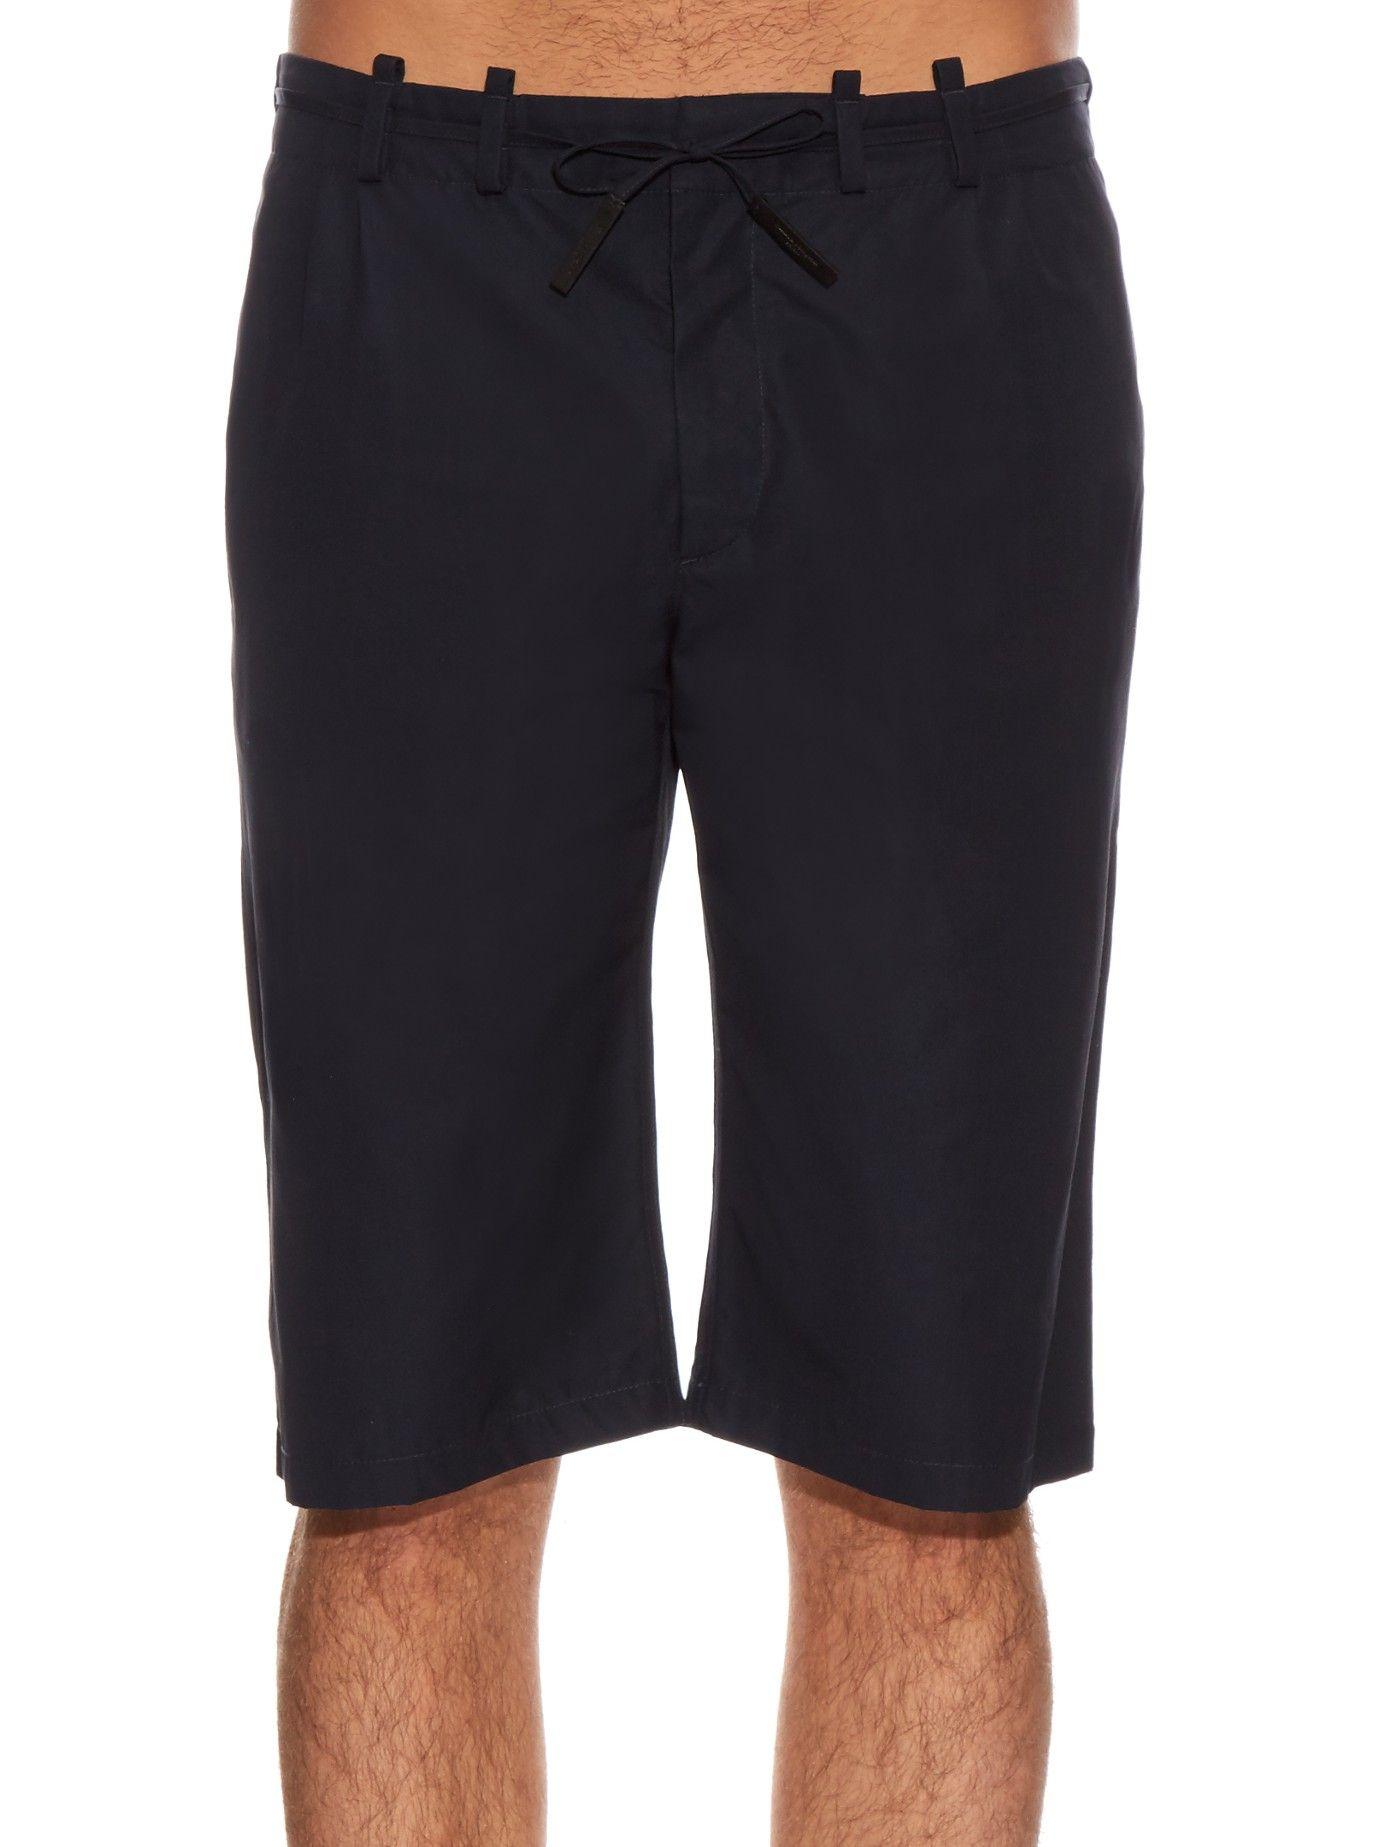 Cotton-poplin shorts   Maison Margiela   MATCHESFASHION.COM US